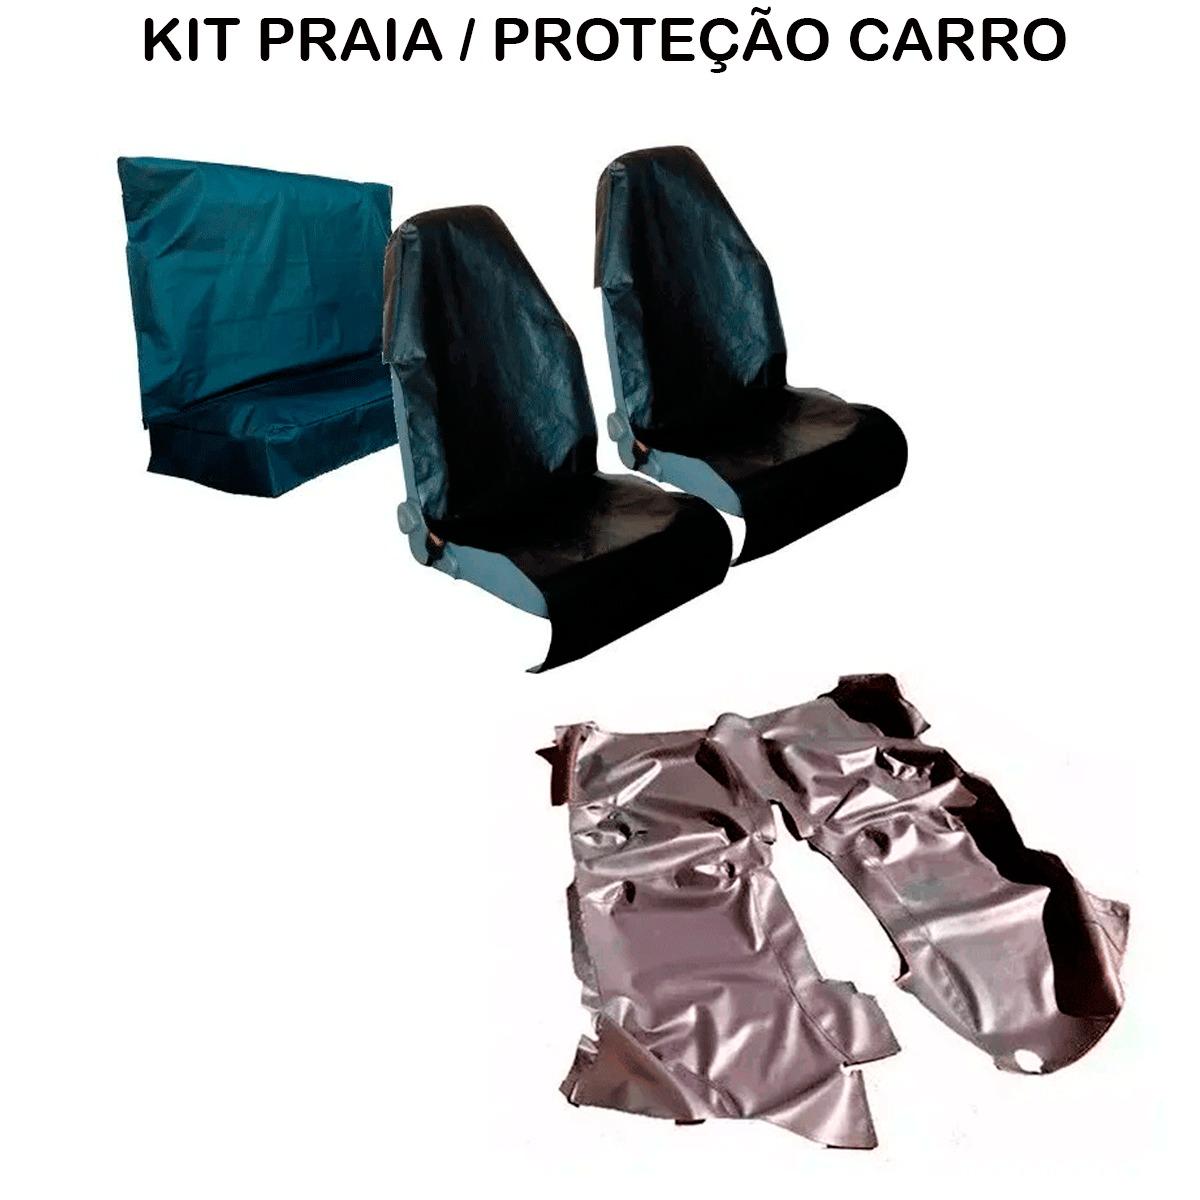 Tapete Em Vinil Volkswagen Saveiro Dupla + Capa Banco Protecao Banco Areia Suor Academia